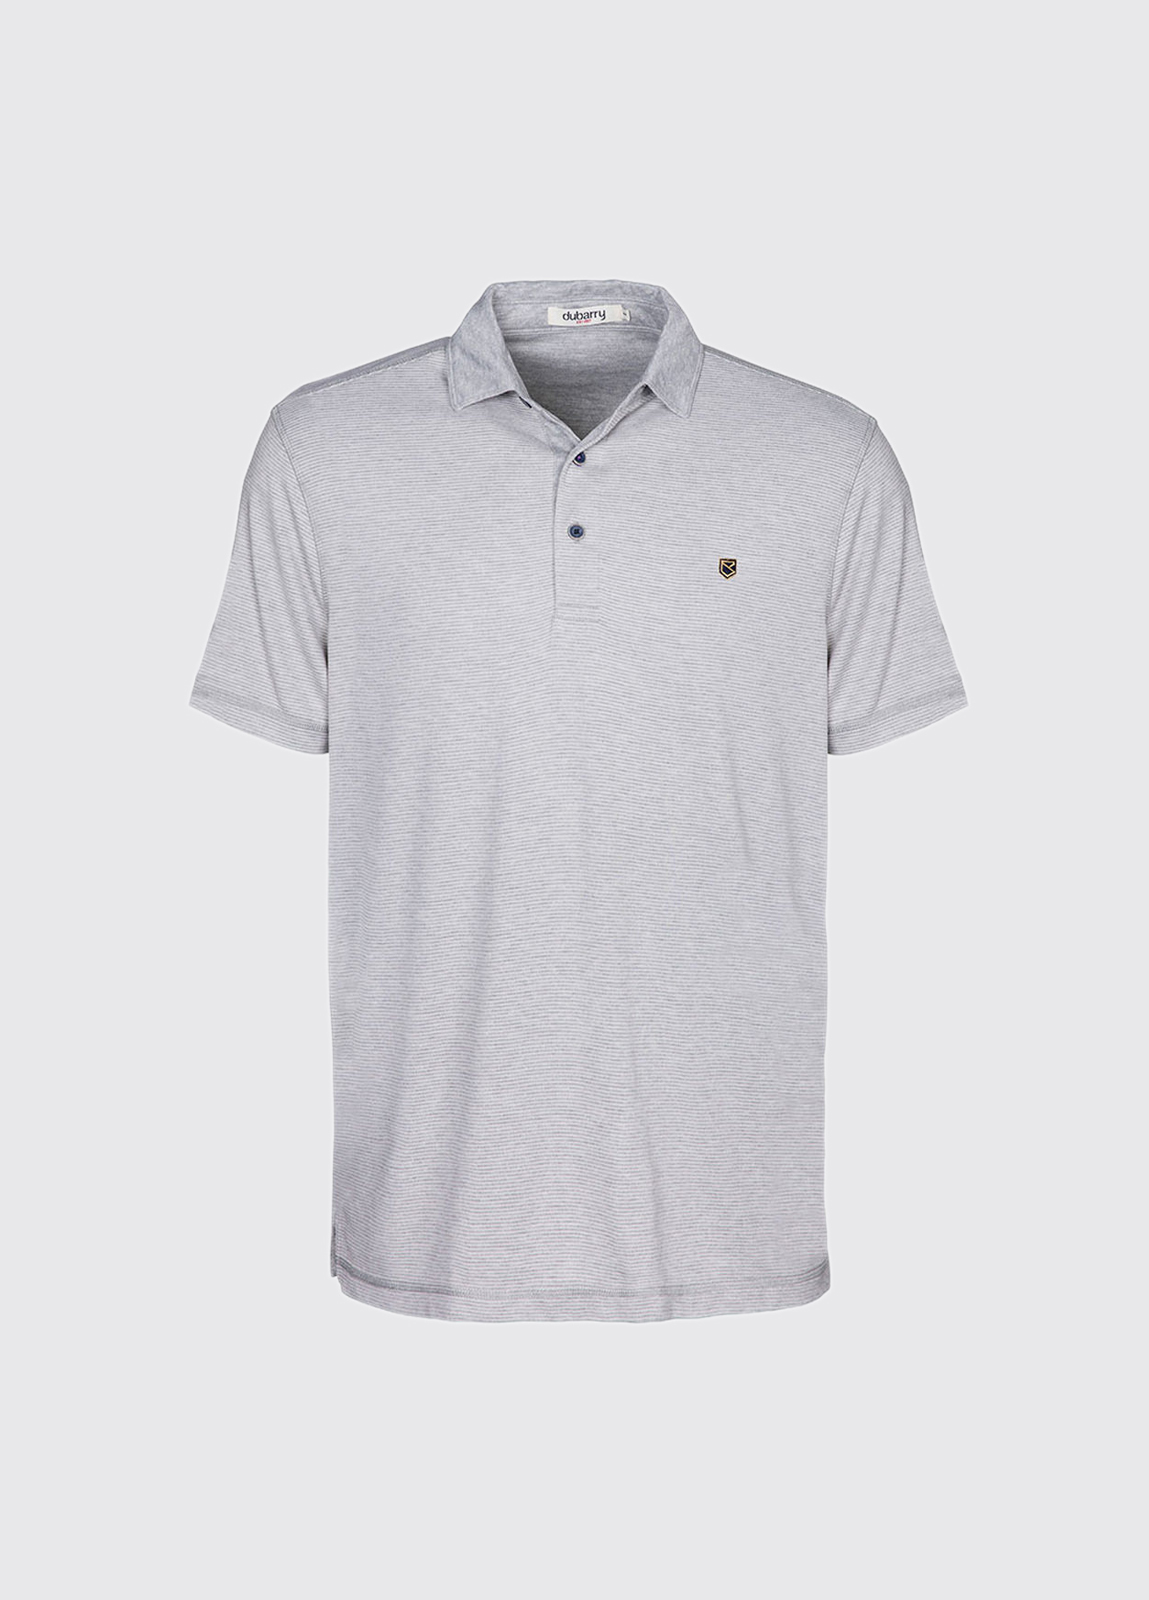 Drumcliff Polo Shirt - Shale